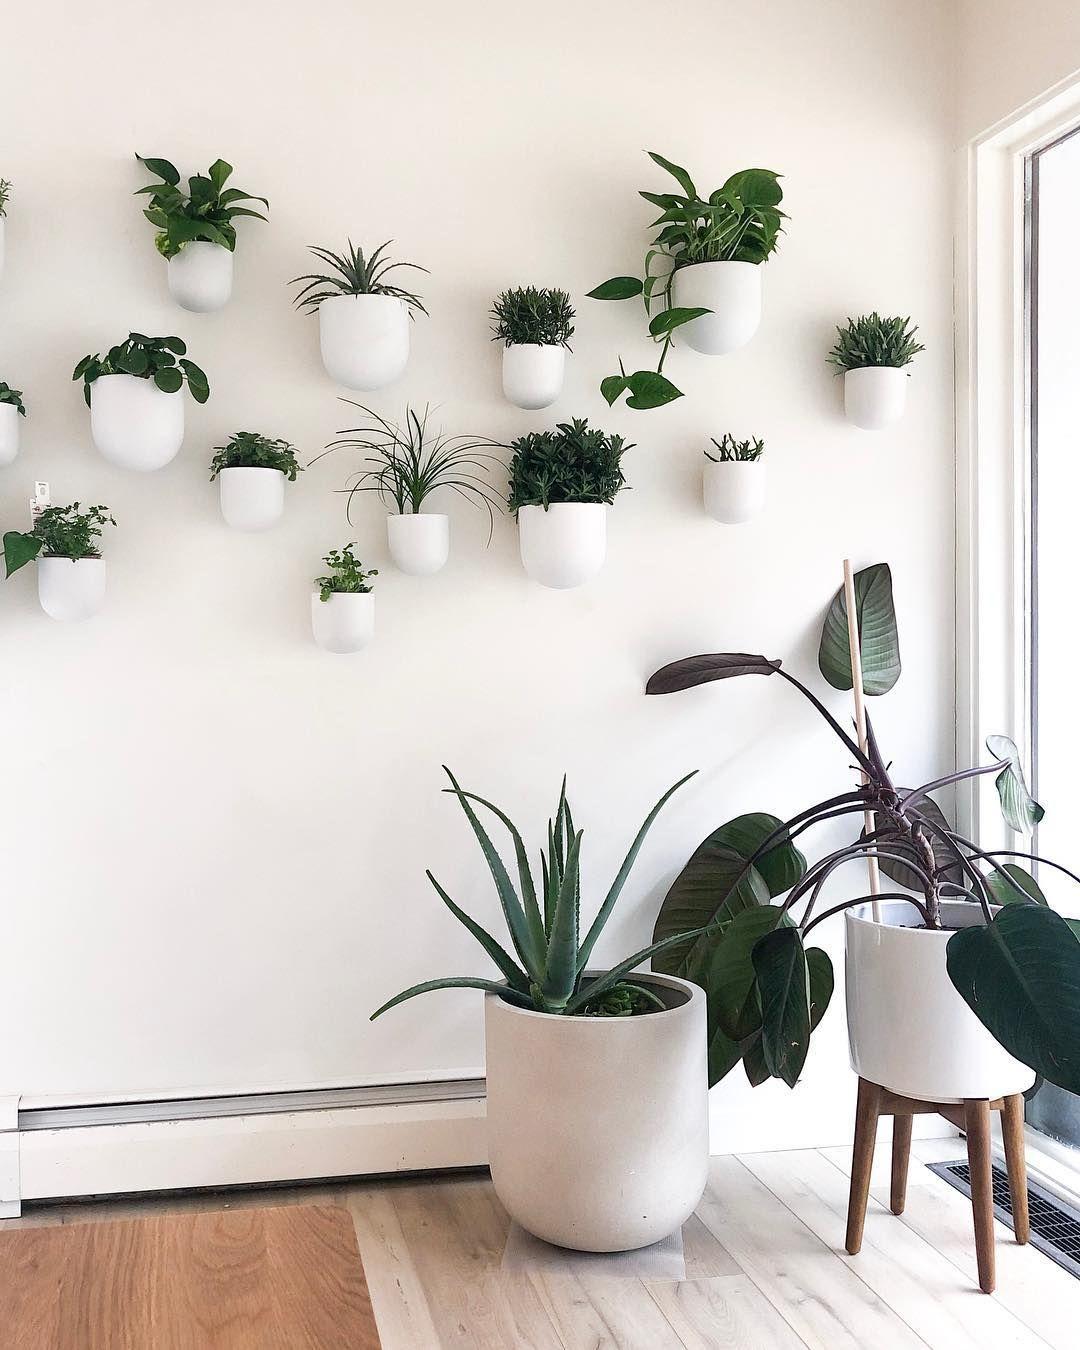 Houseplants Indoor Plants Plants Decor Home Decor Interior Style Plant Corner Nordic Style Scandinavian Living Plant Wall Decor Plant Decor Indoor Plant Decor